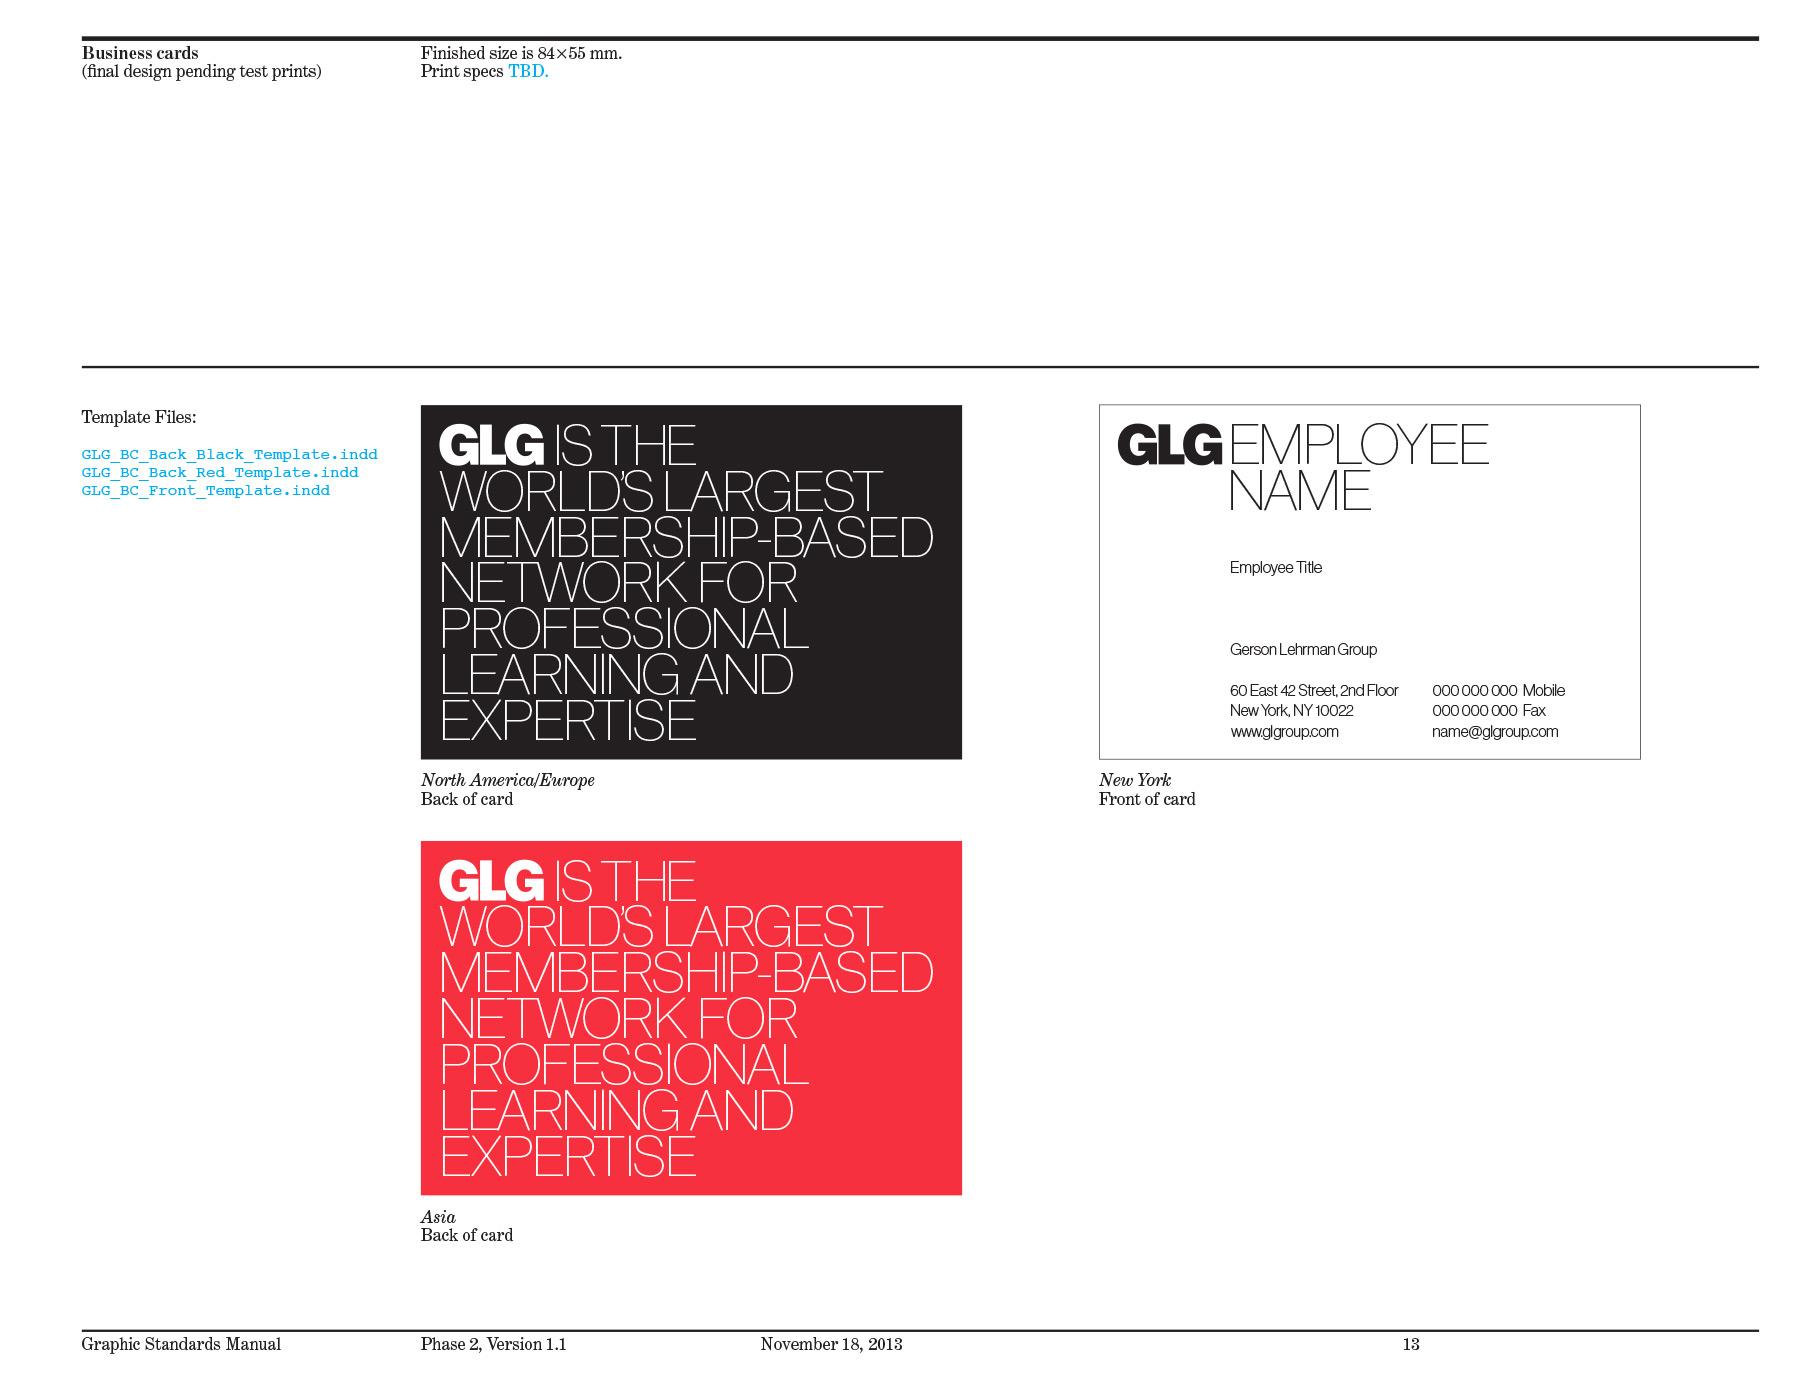 GLG_StandardsManual_131120_02-5.139.jpg